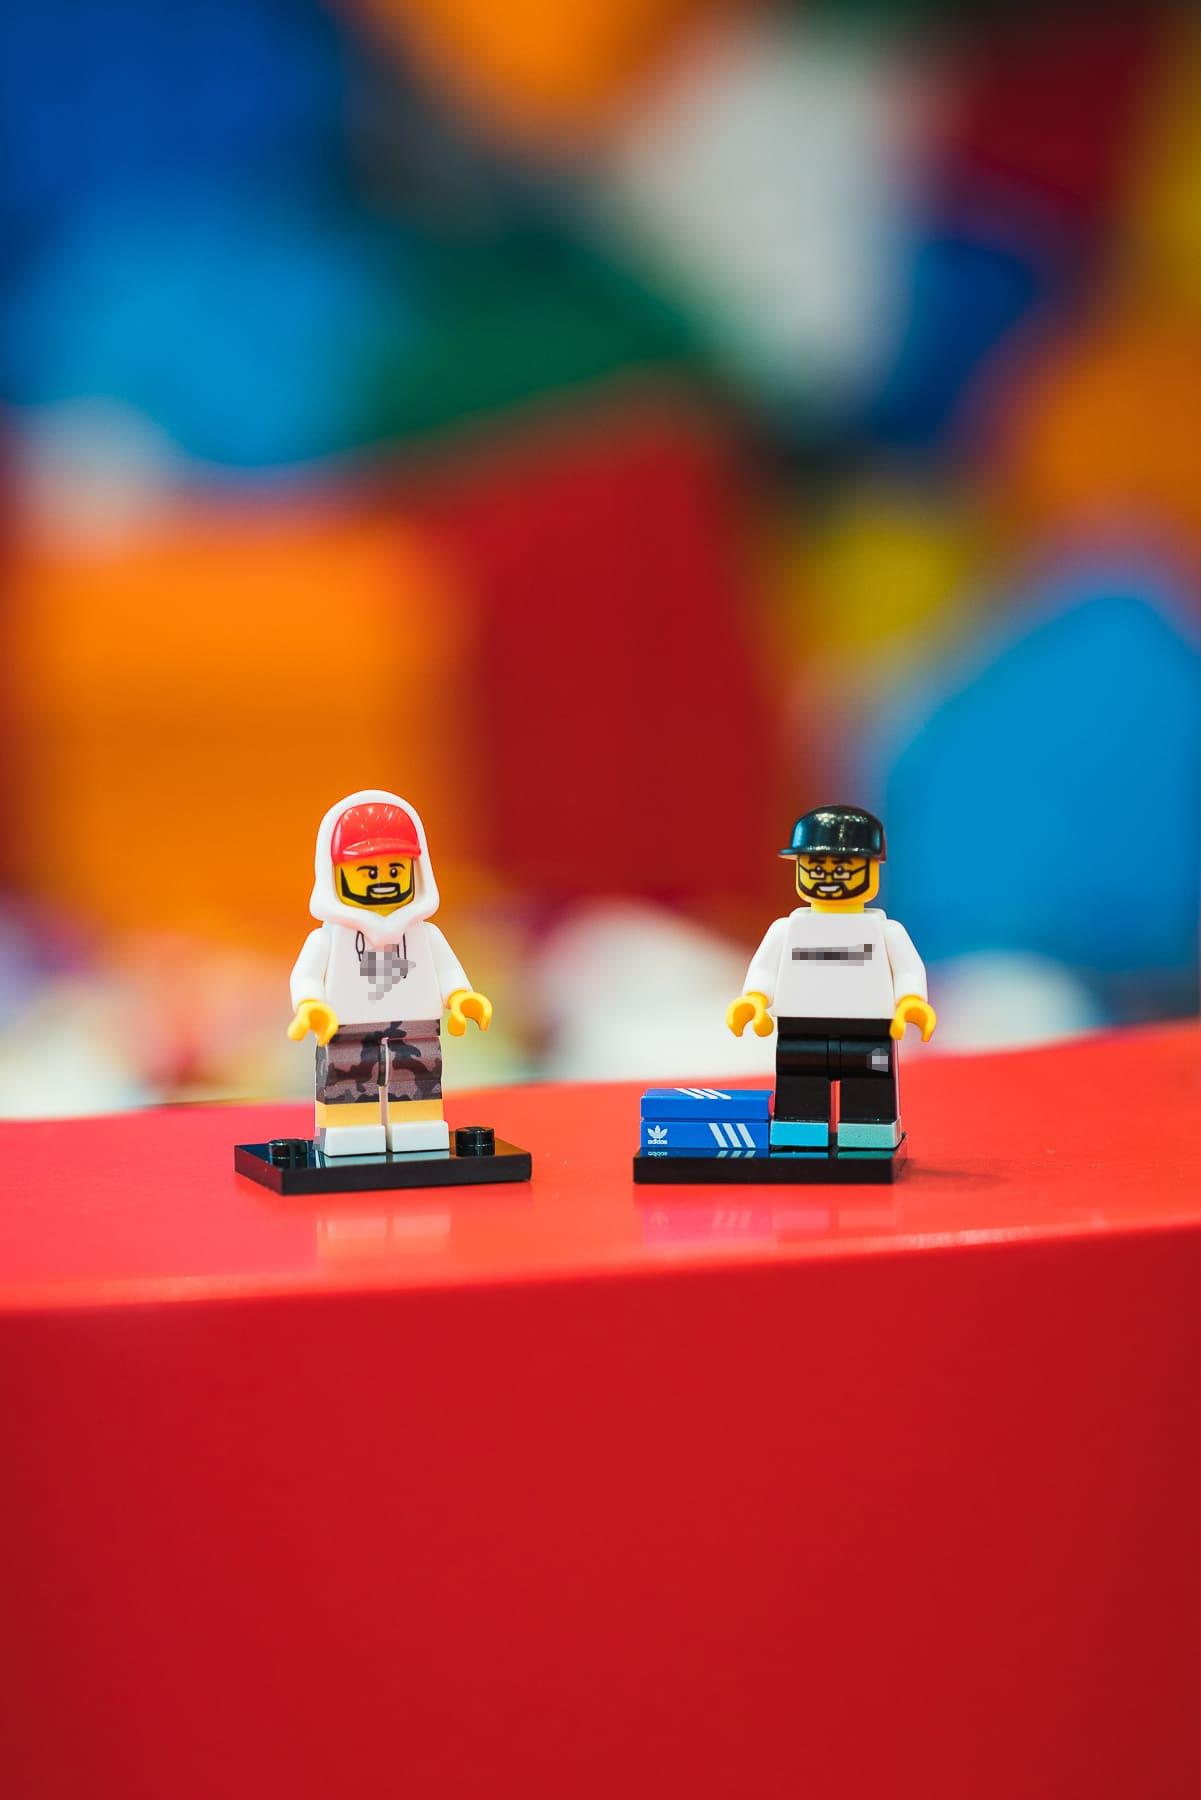 LEGO X Adidas X 43einhalb X Overkill 28